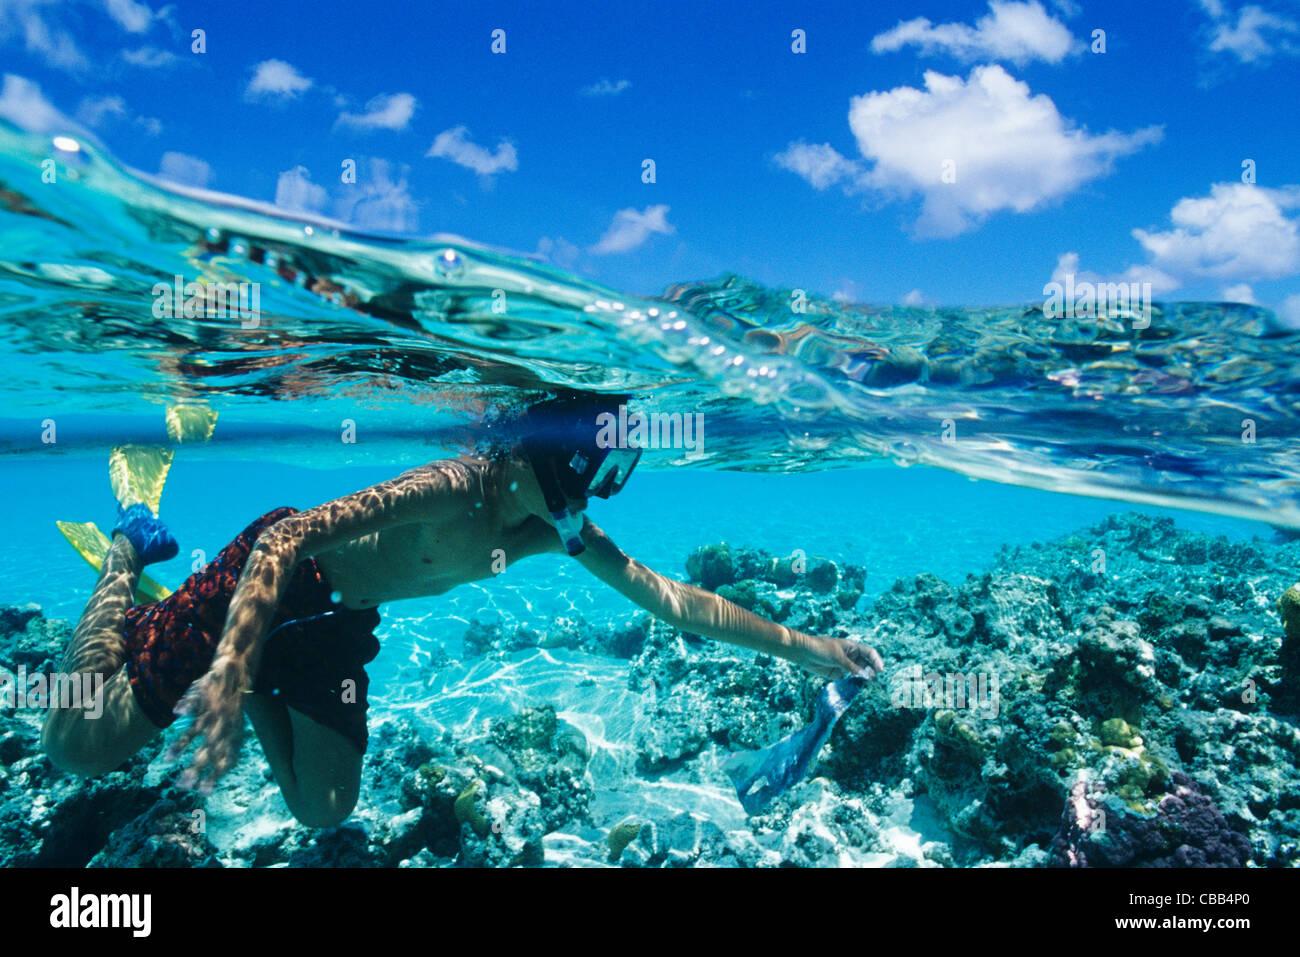 Black Live Wallpaper Cook Islands Kūki Āirani South Pacific Ocean Aitutaki